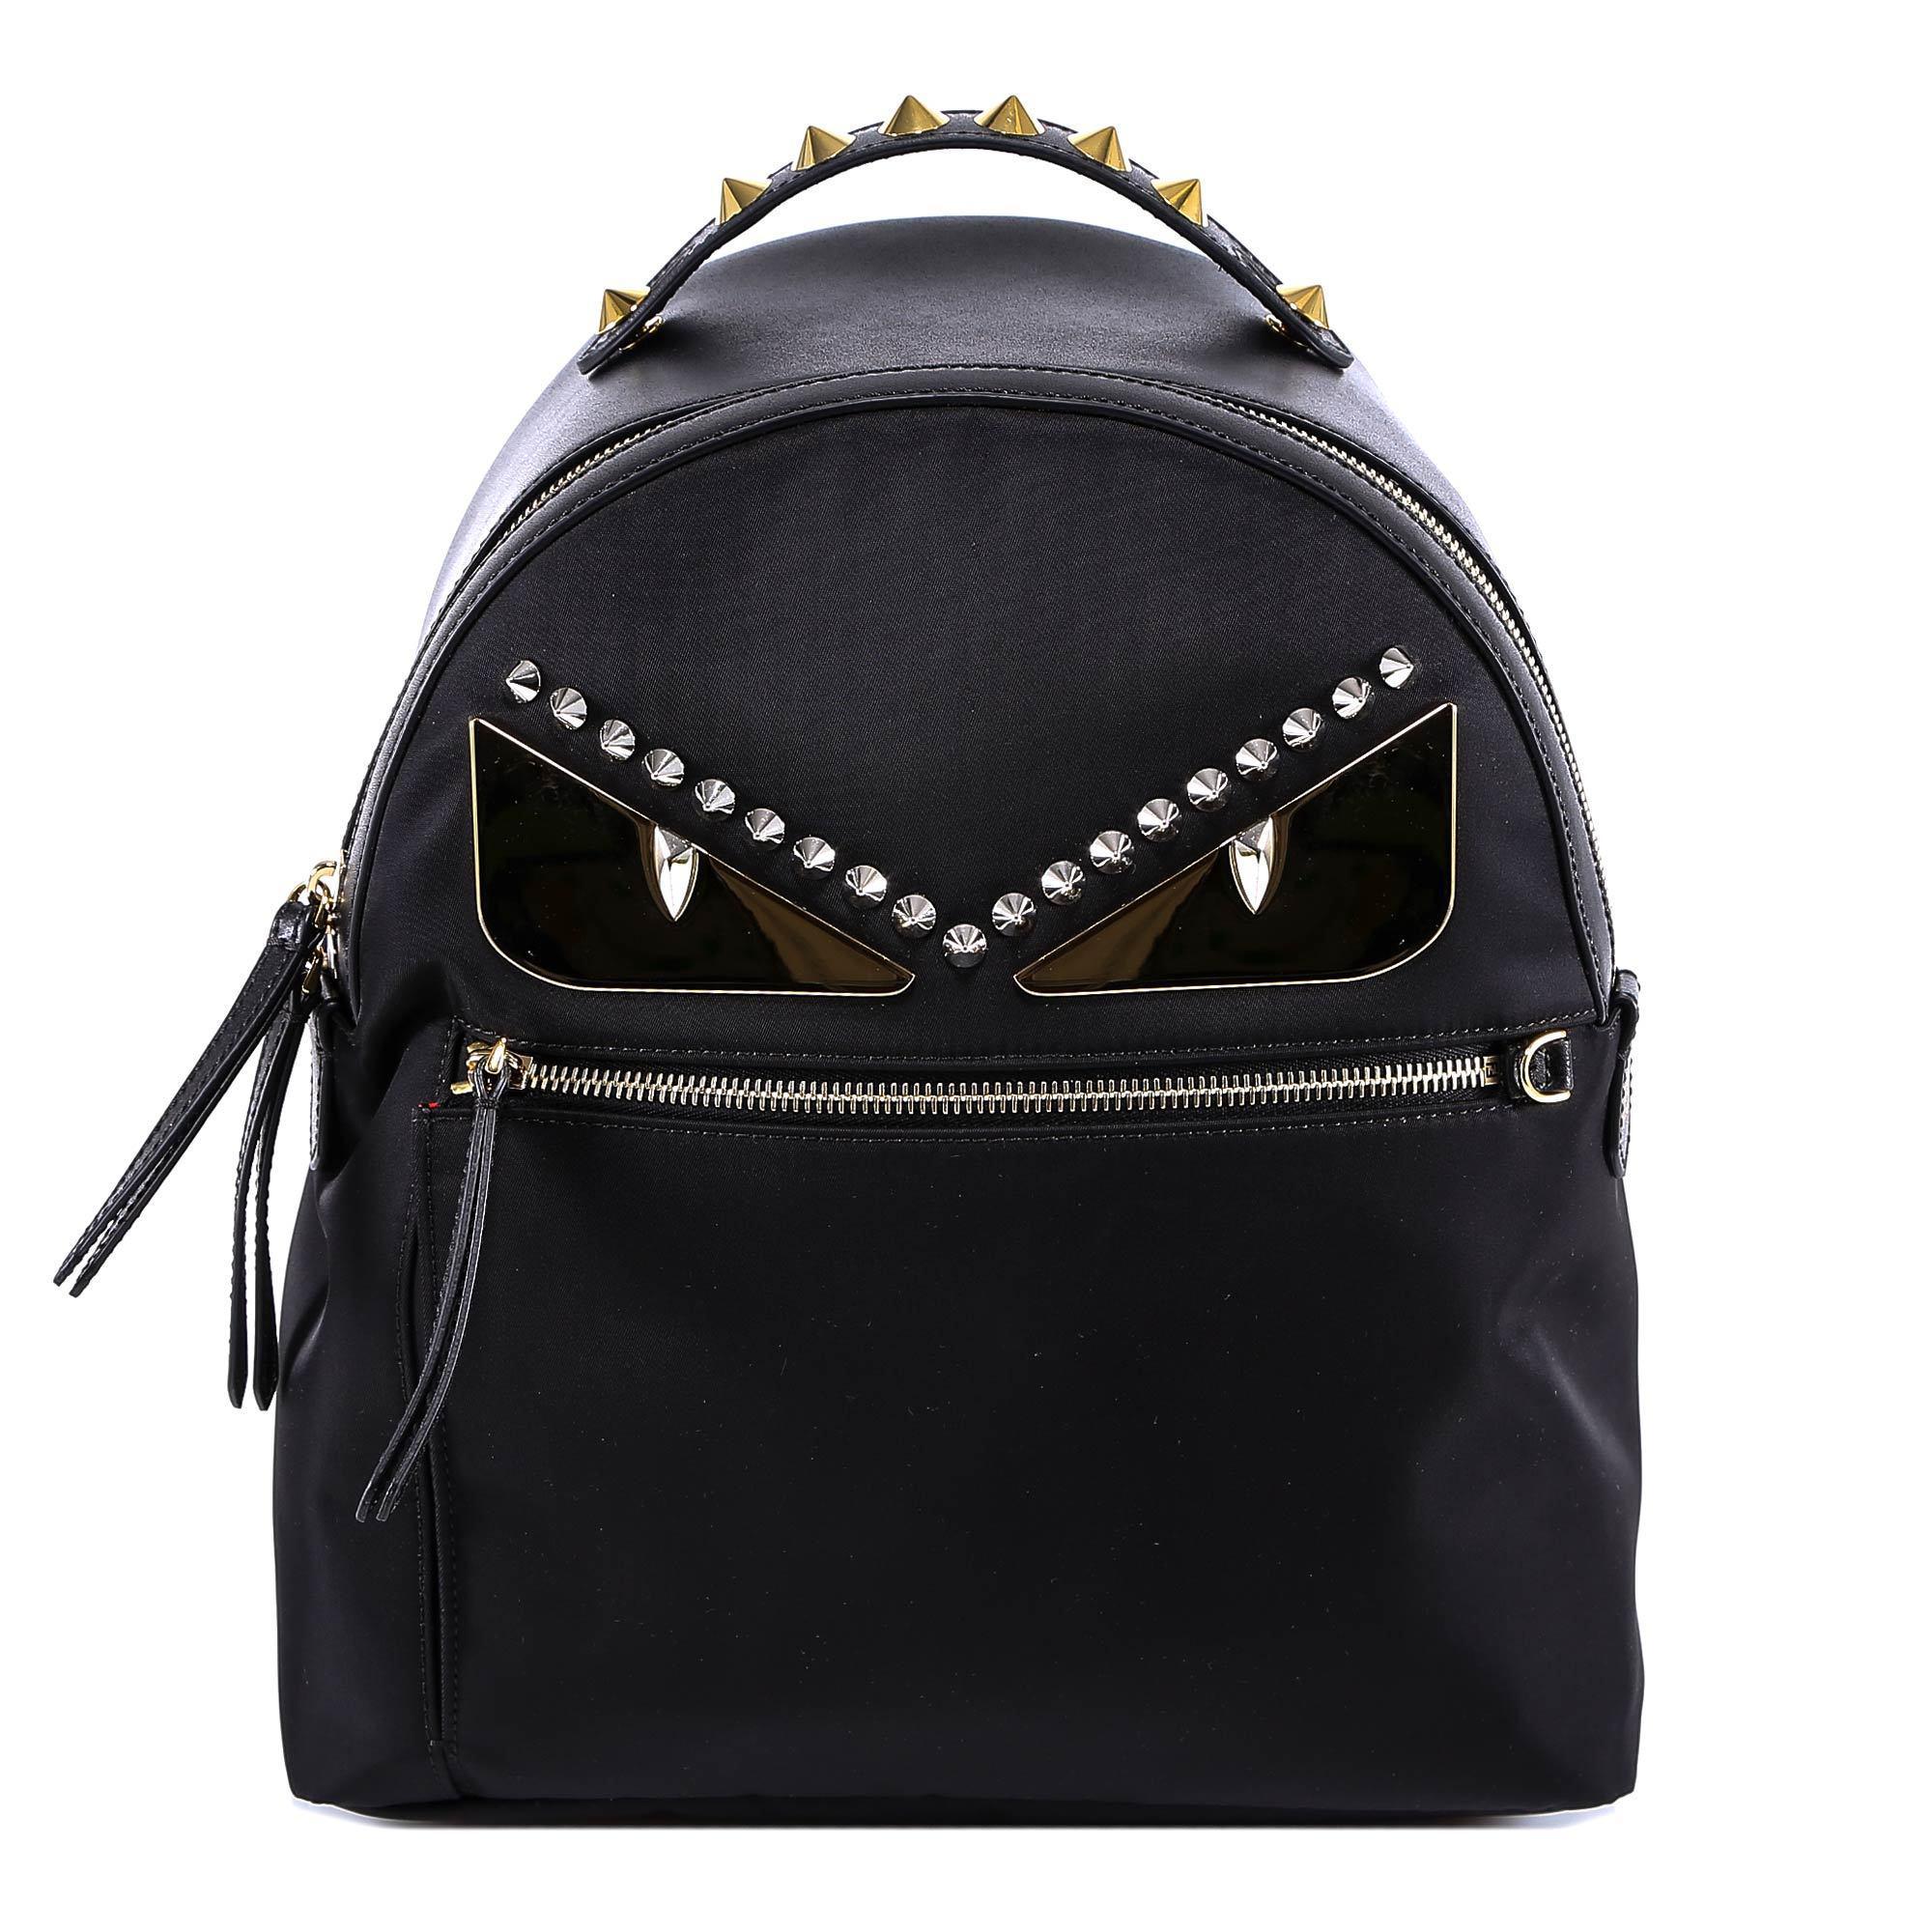 3cbf847a8510 Fendi Classic Bag Bugs Backpack in Black - Lyst